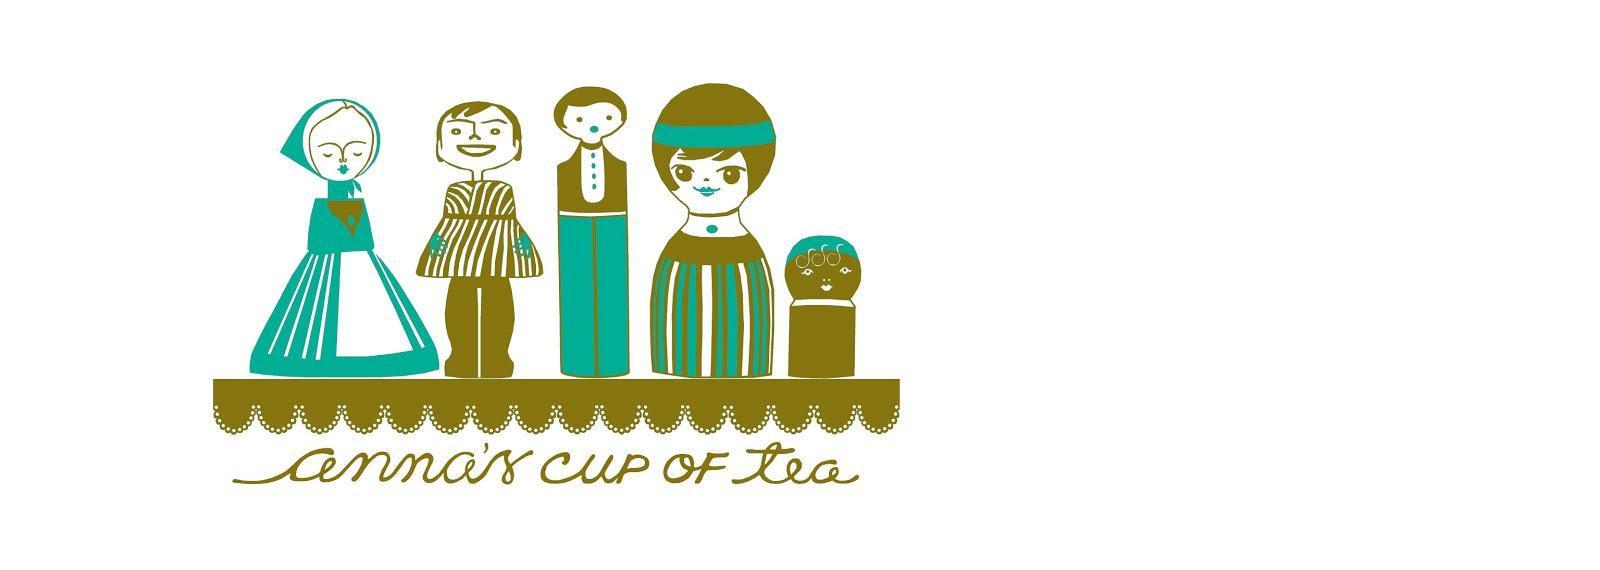 anna's cup of tea